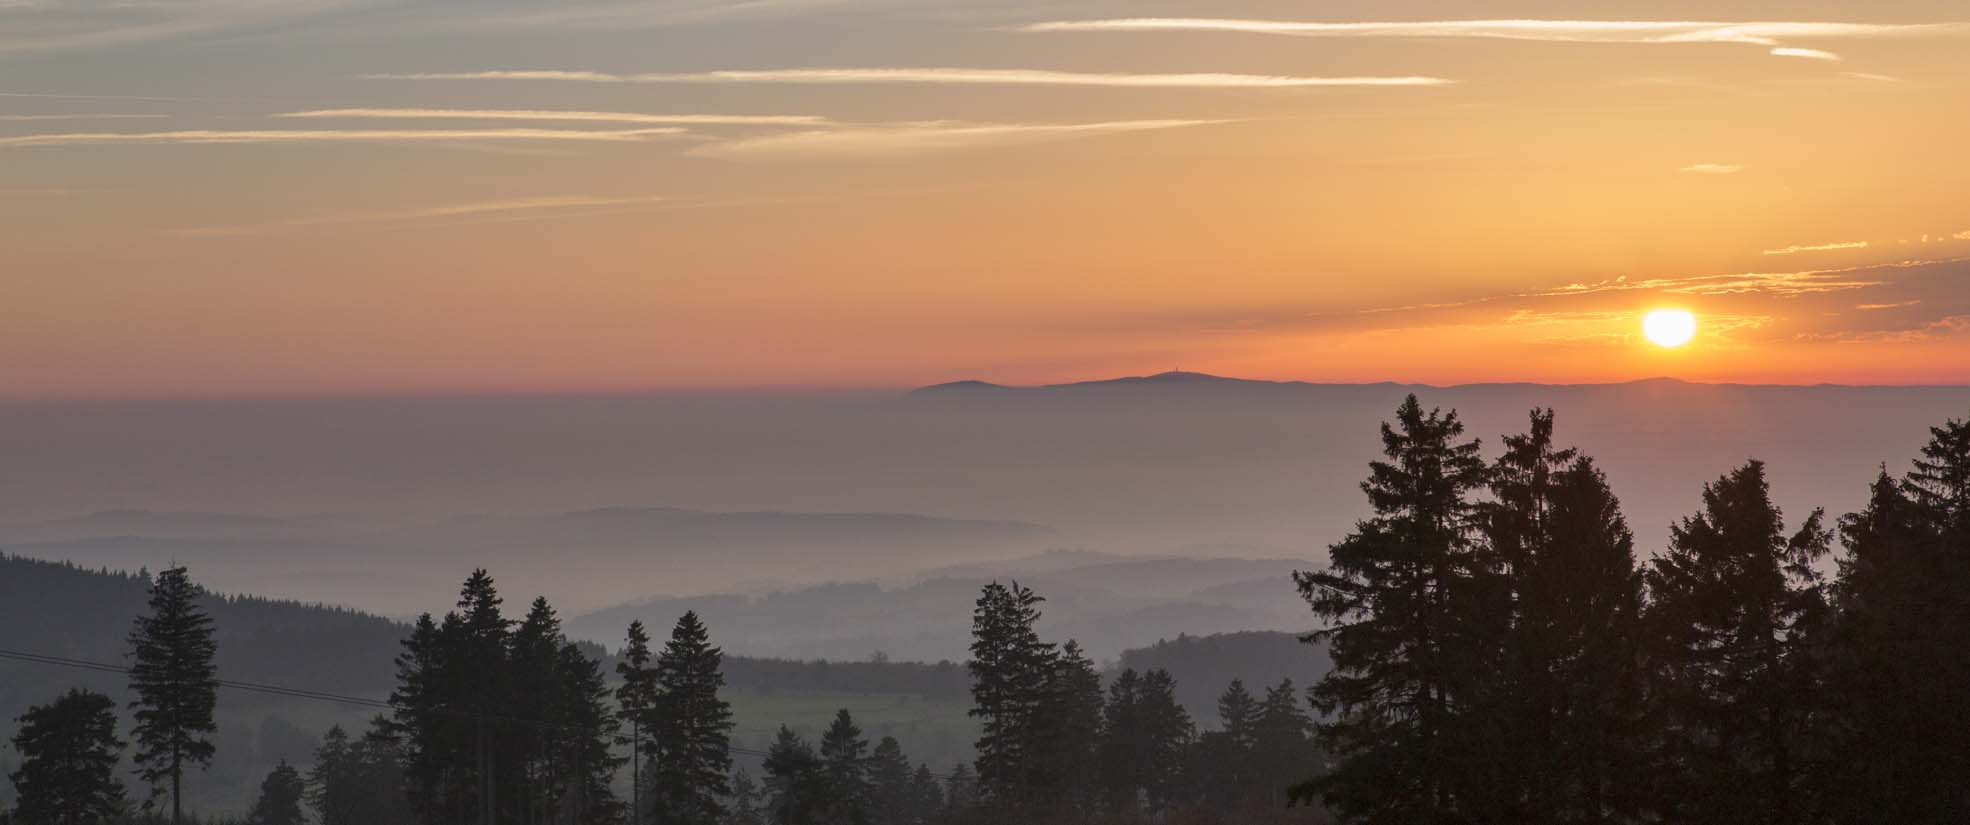 Höhenblick: Sonnenuntergang über dem Taunus